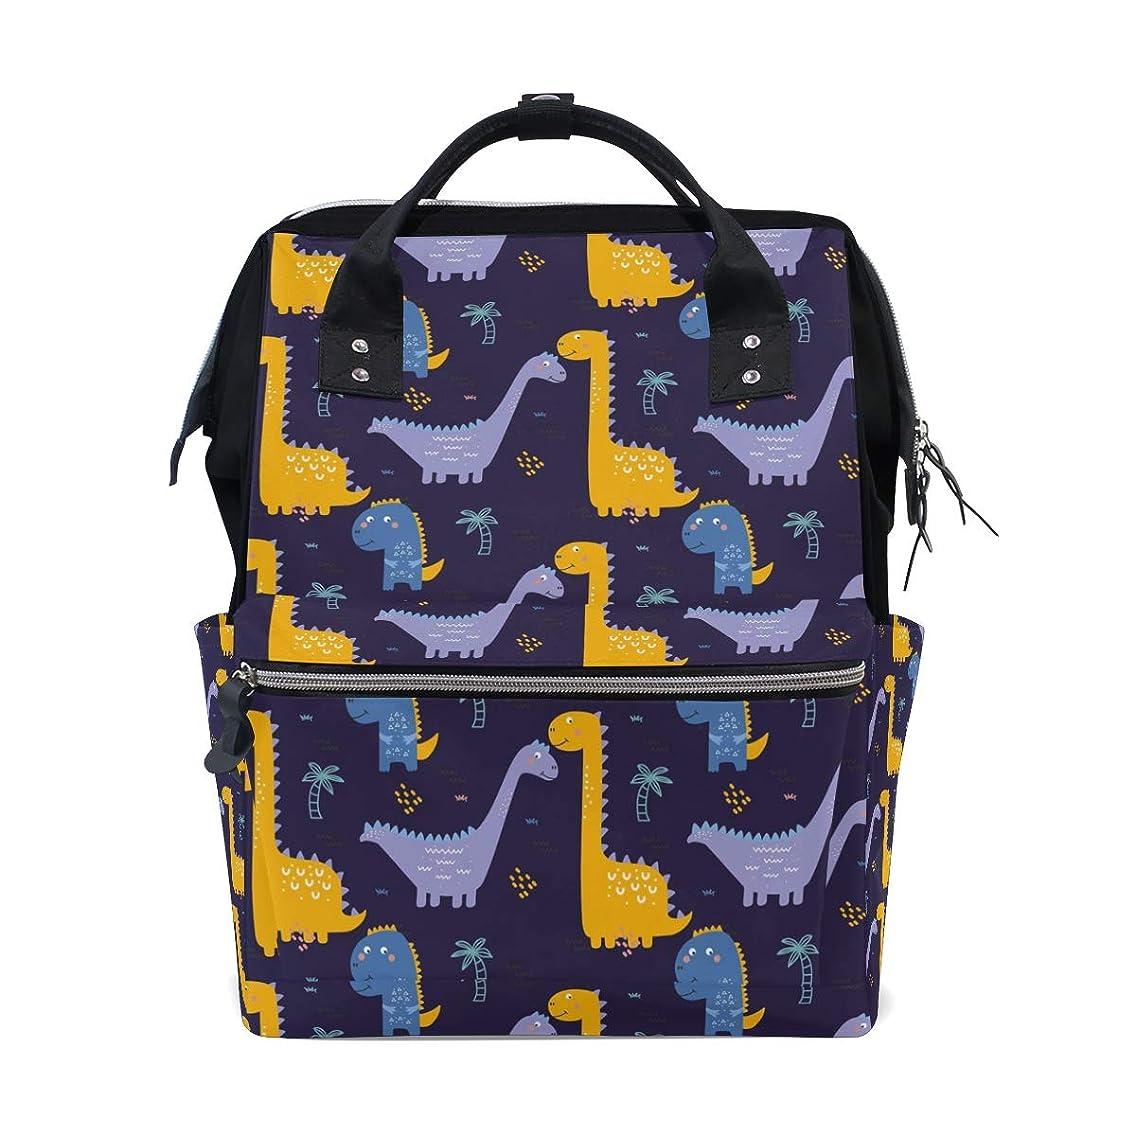 Cute Cartoon Dinosaurs School Backpack Large Capacity Mummy Bags Laptop Handbag Casual Travel Rucksack Satchel For Women Men Adult Teen Children